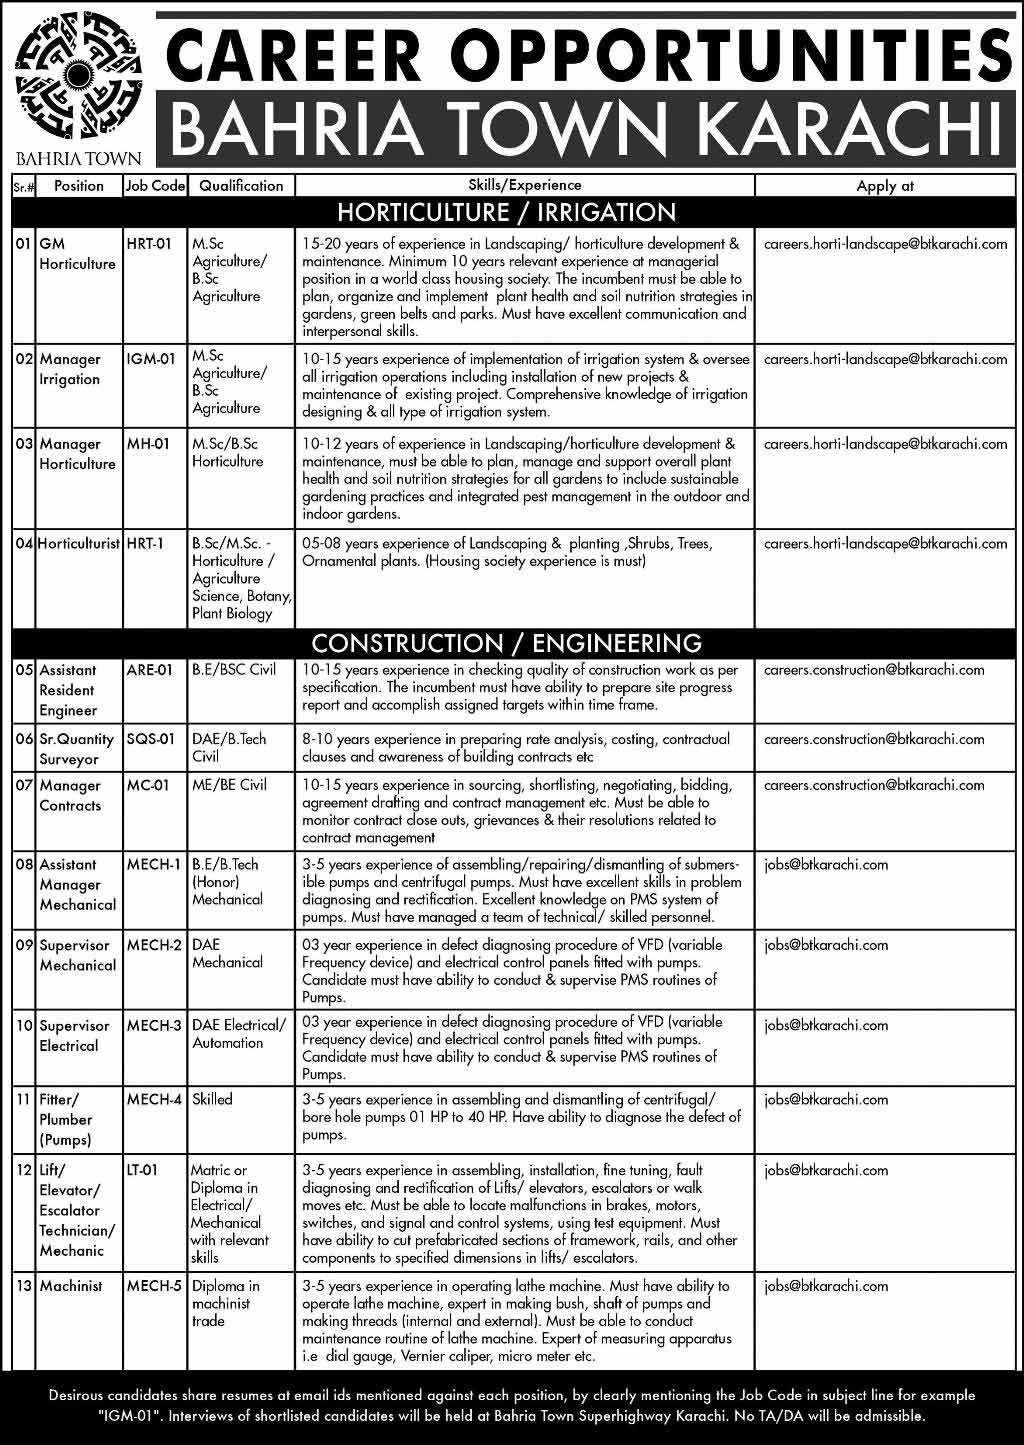 Bahria Town Karachi Latest Jobs November 2018